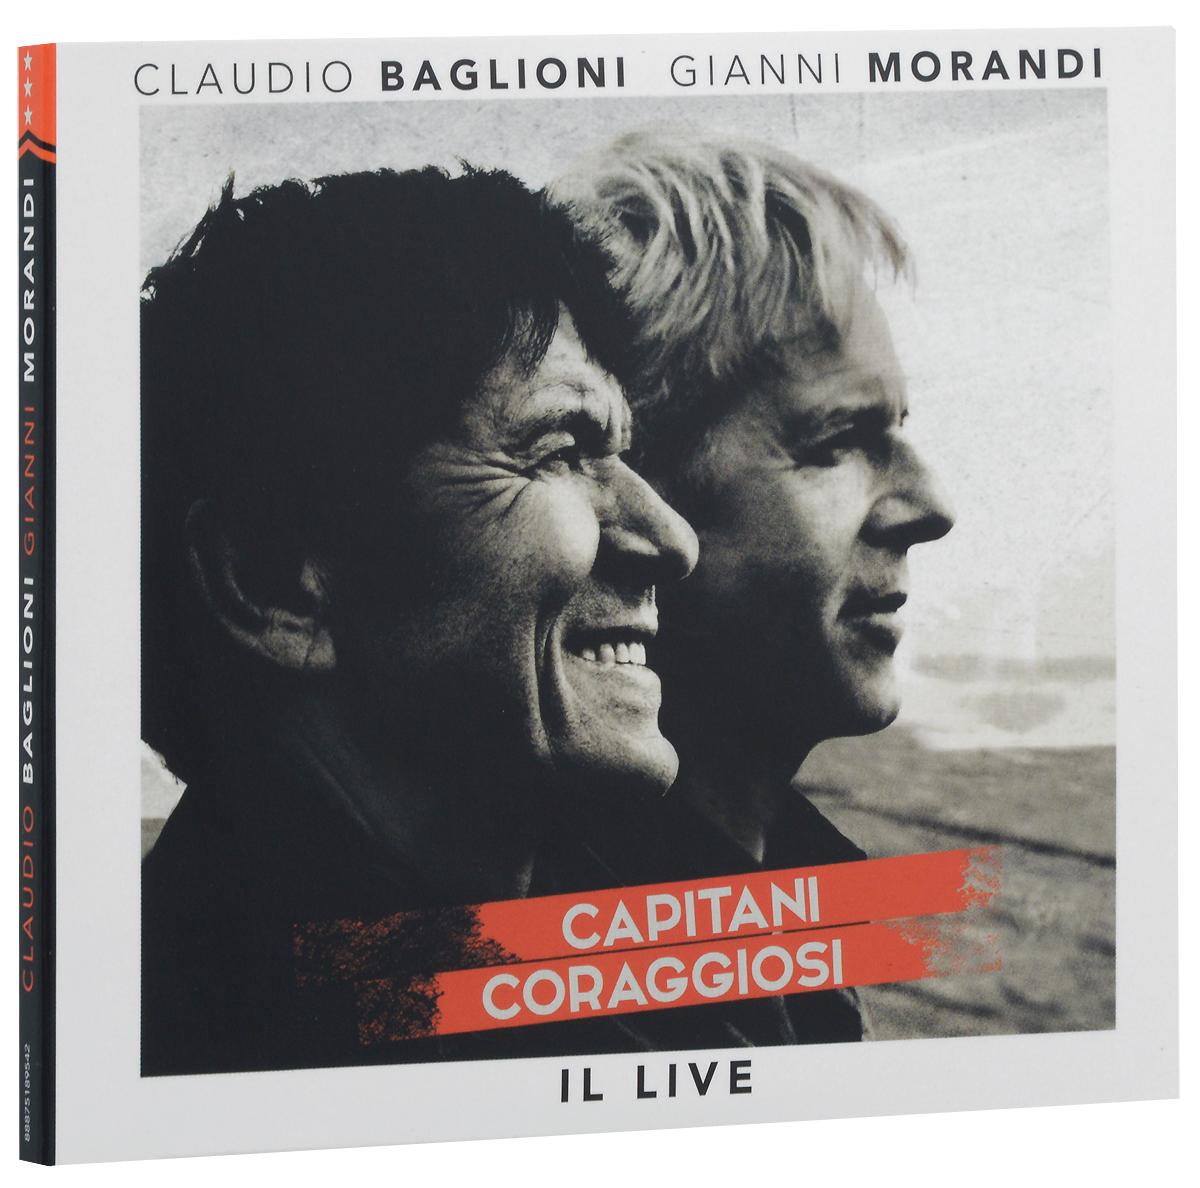 цены Клаудио Баглиони,Джанни Моранди Claudio Baglioni. Gianni Morandi. Capitani Coraggiosi. Il Live (2 CD)